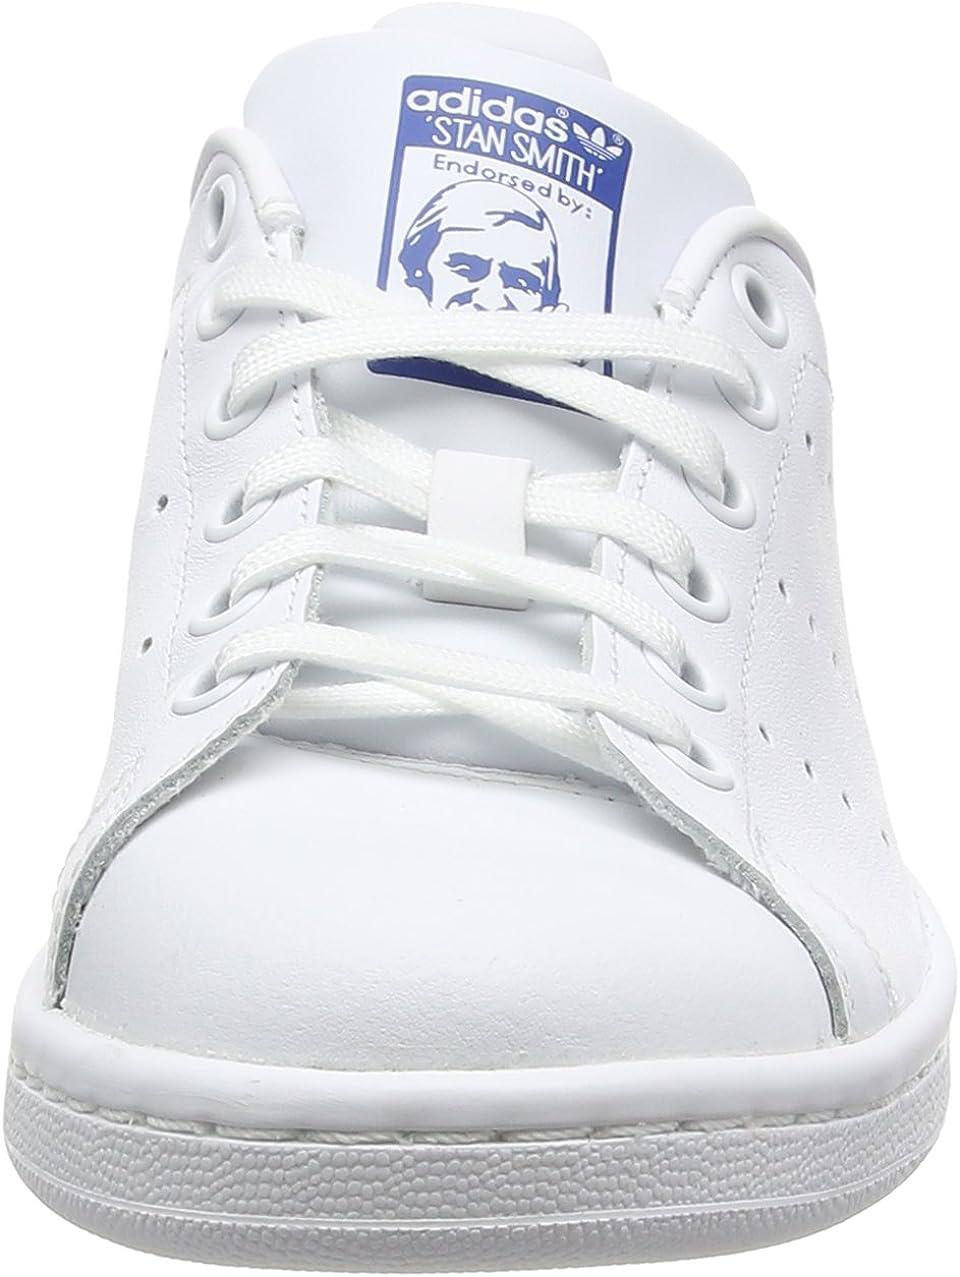 adidas Stan Smith, Baskets Basses garçon